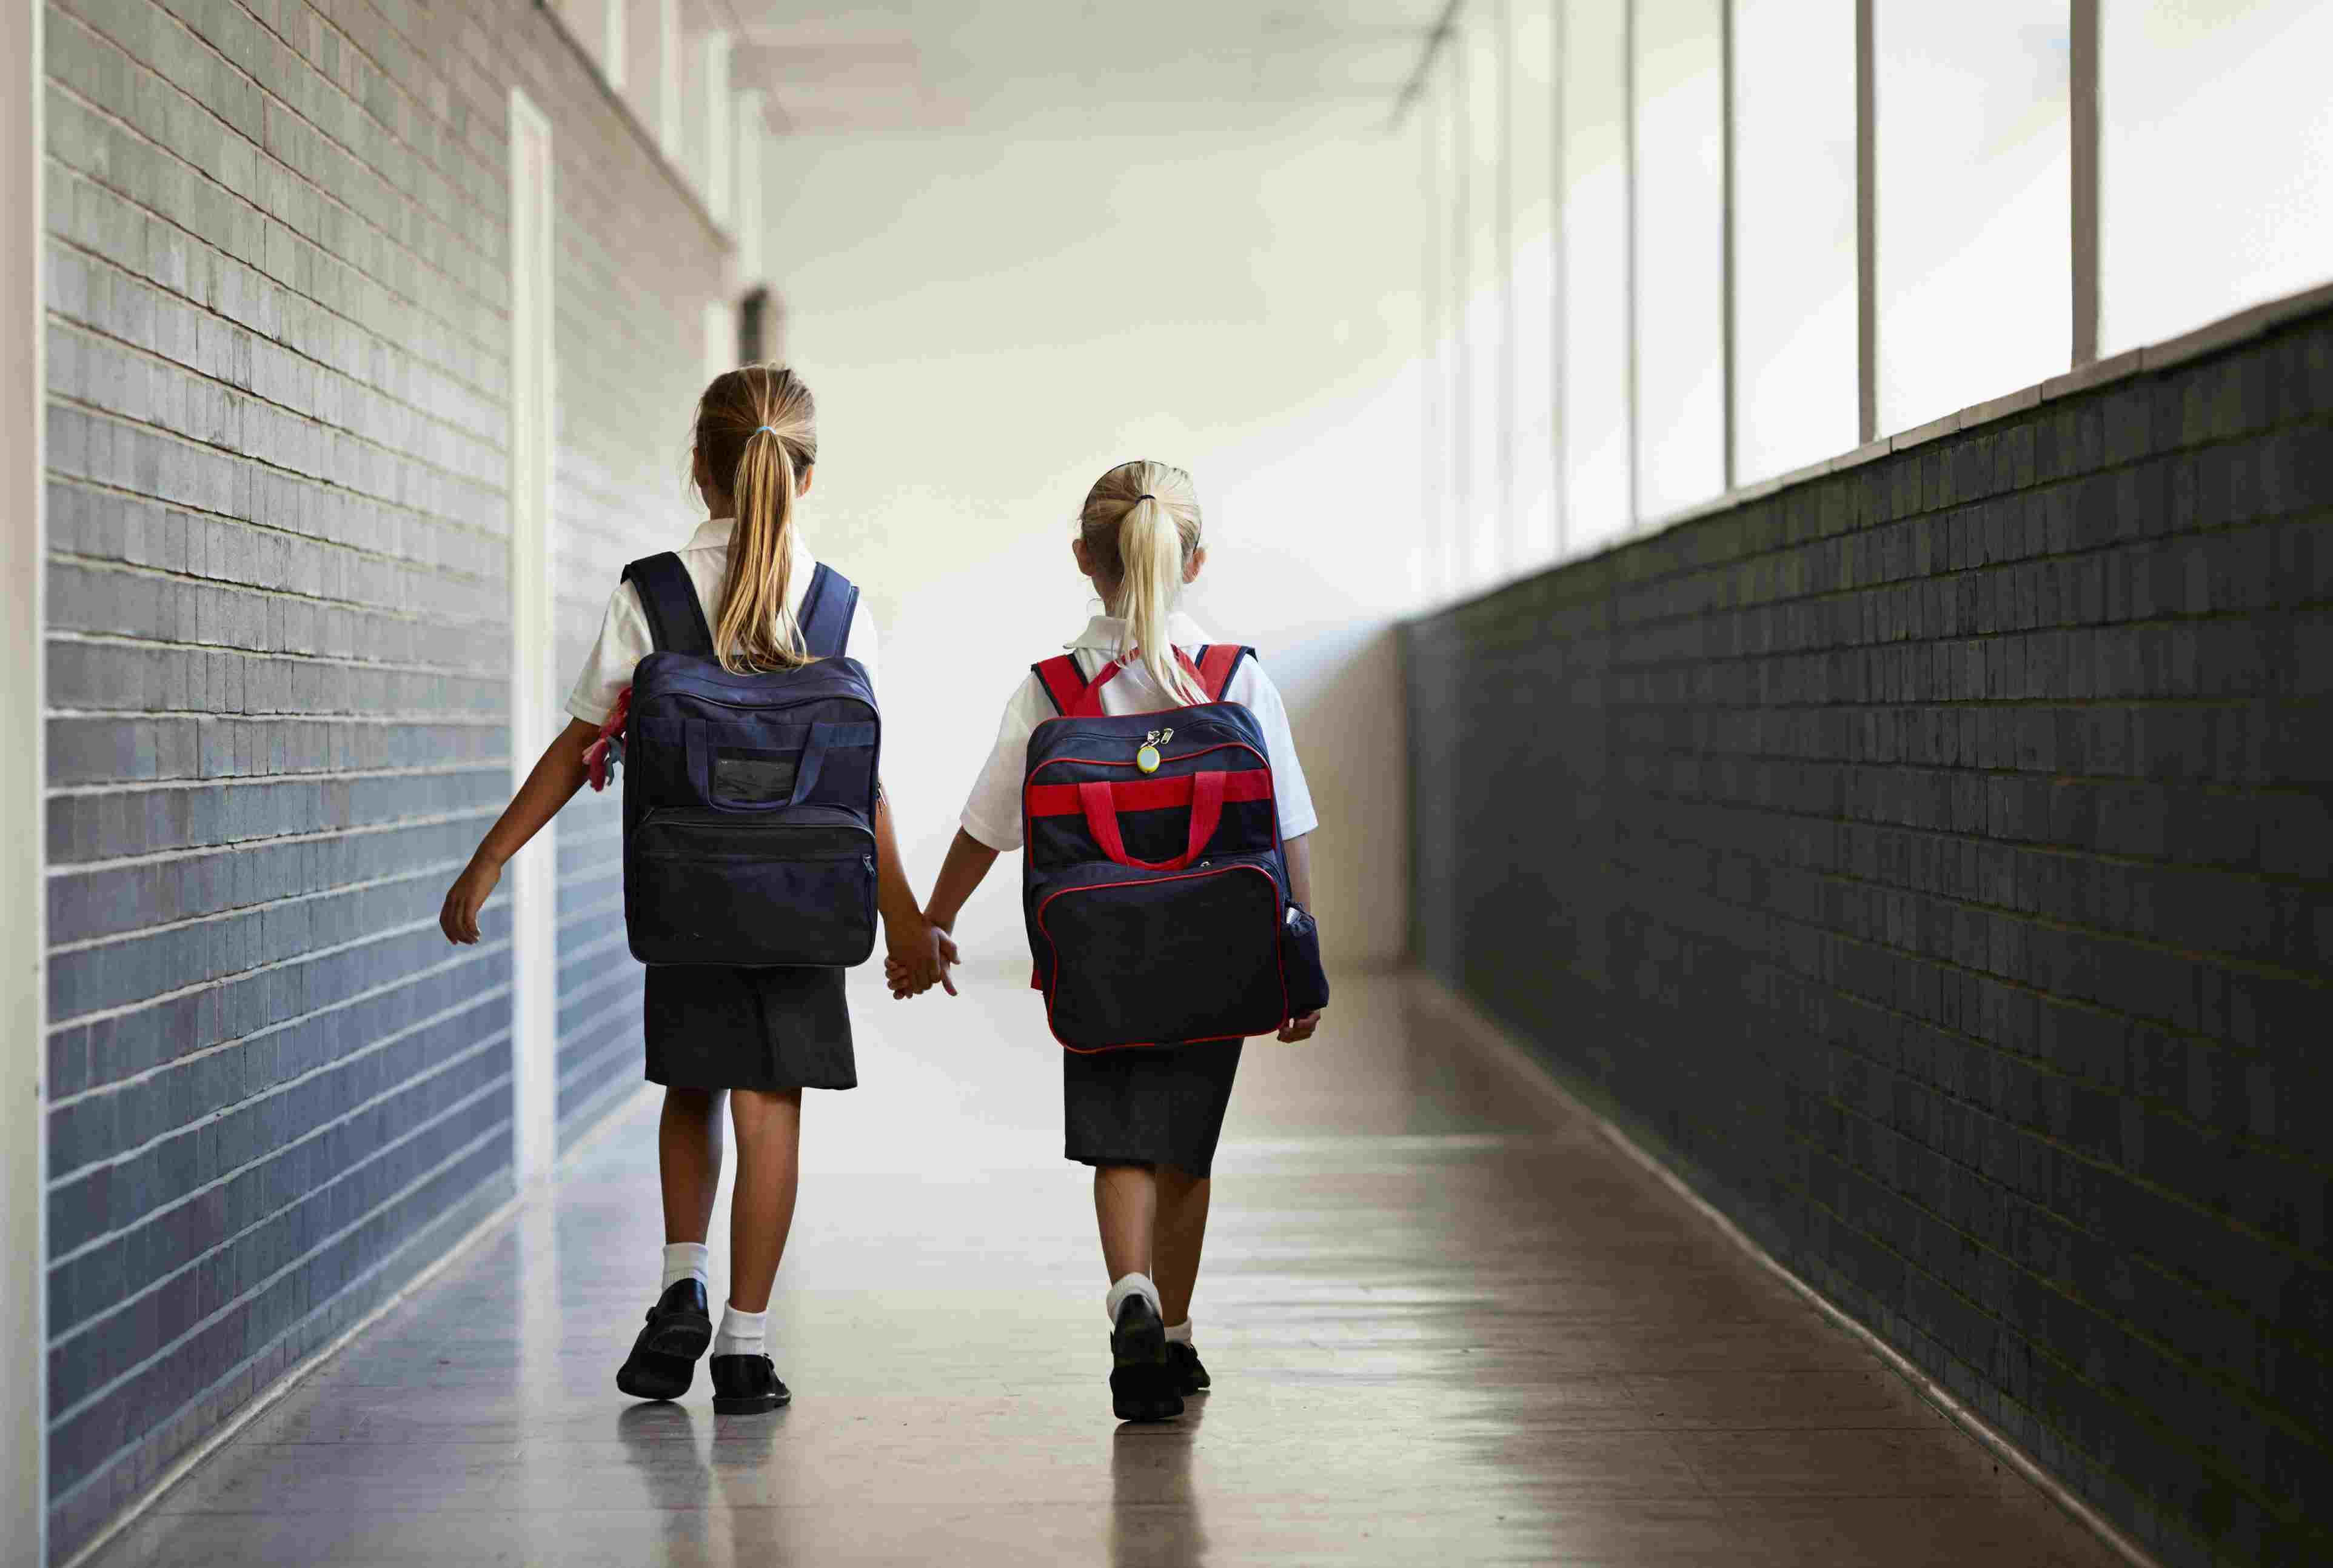 f2a1ccf28b Schoolgirls walking hand in hand at school isle